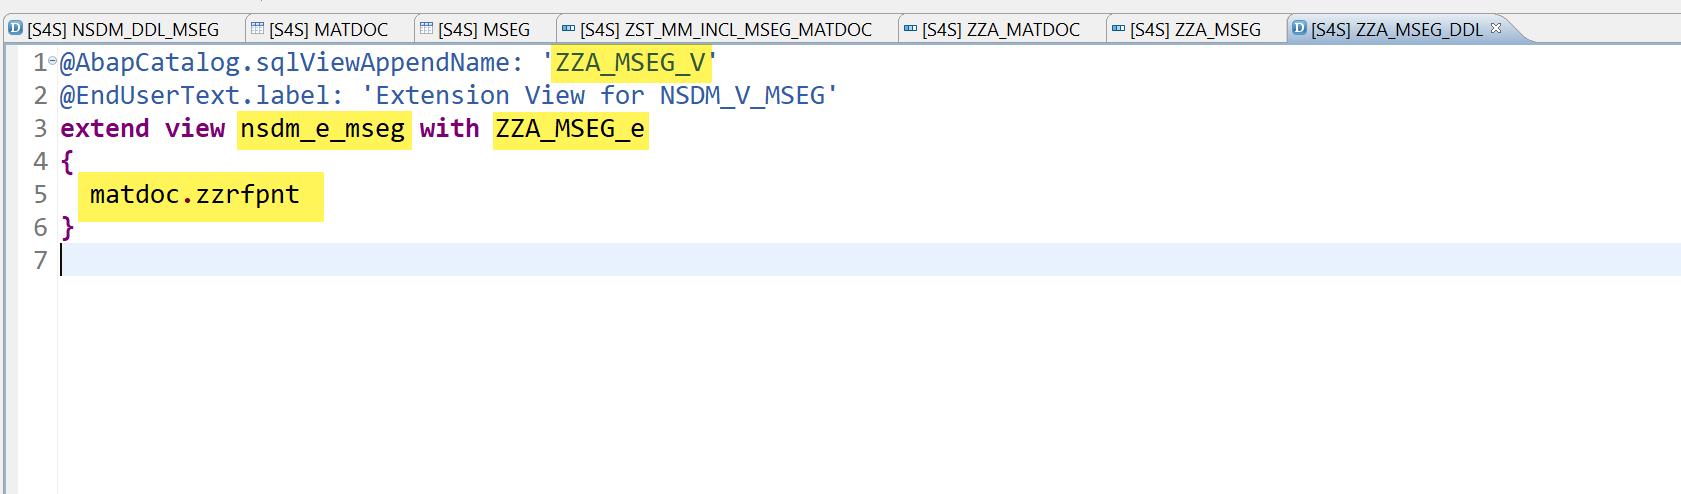 extend view nsdm e mseg